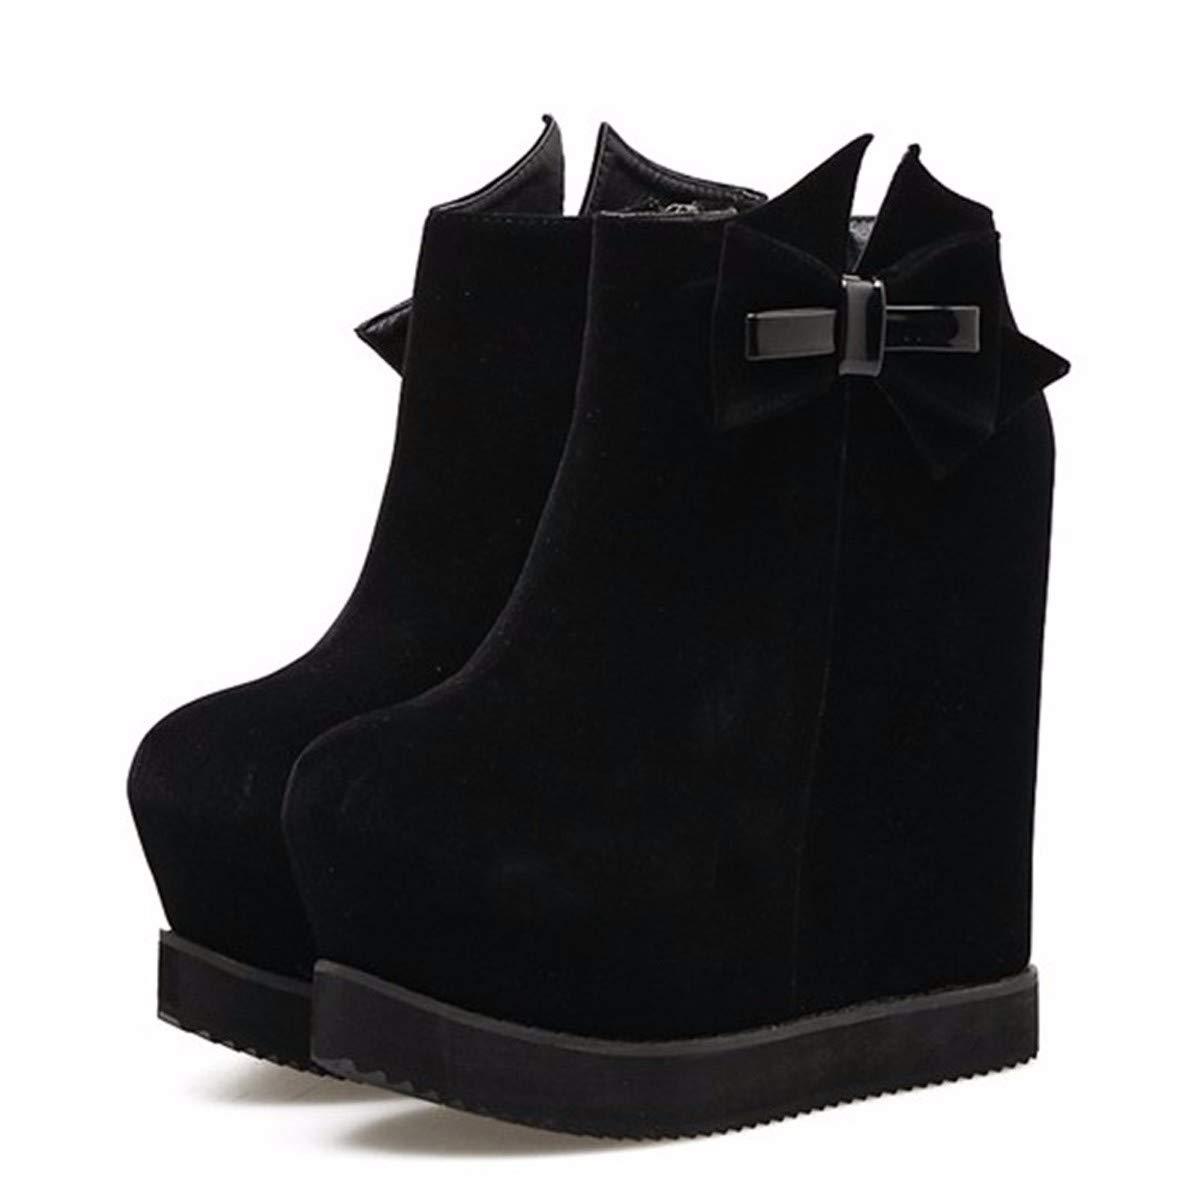 HBDLH Damenschuhe Kurze Stiefel High - 14 cm cm cm Hohe Rein Schwarzen Wildleder Dicke Sohle High - Heel Steigung Ferse Ma Dingxue. a31465